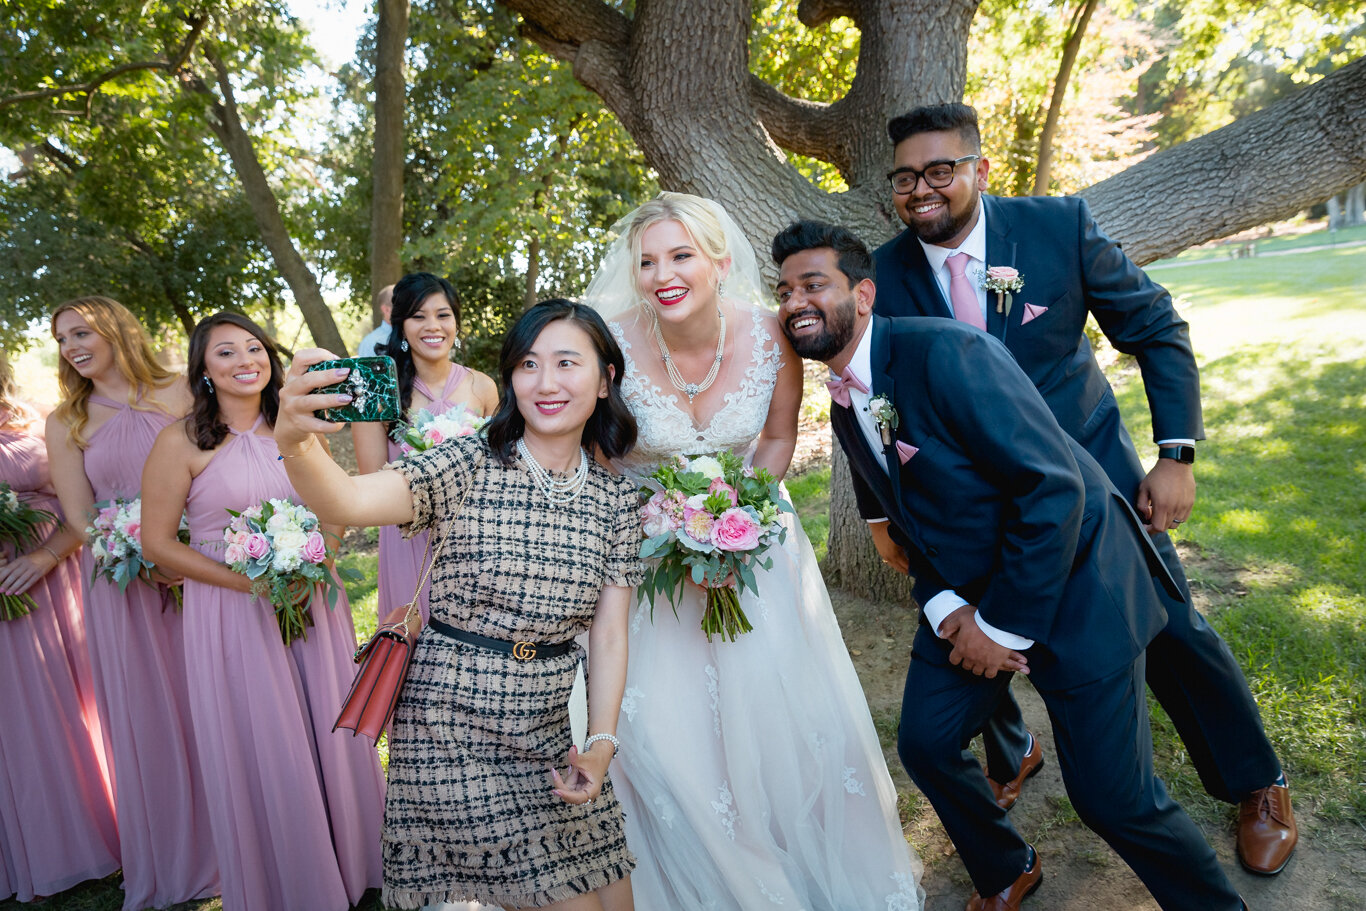 2019.08.24_Emily-Ashir-Wedding-at-the-Maples-5774.jpg